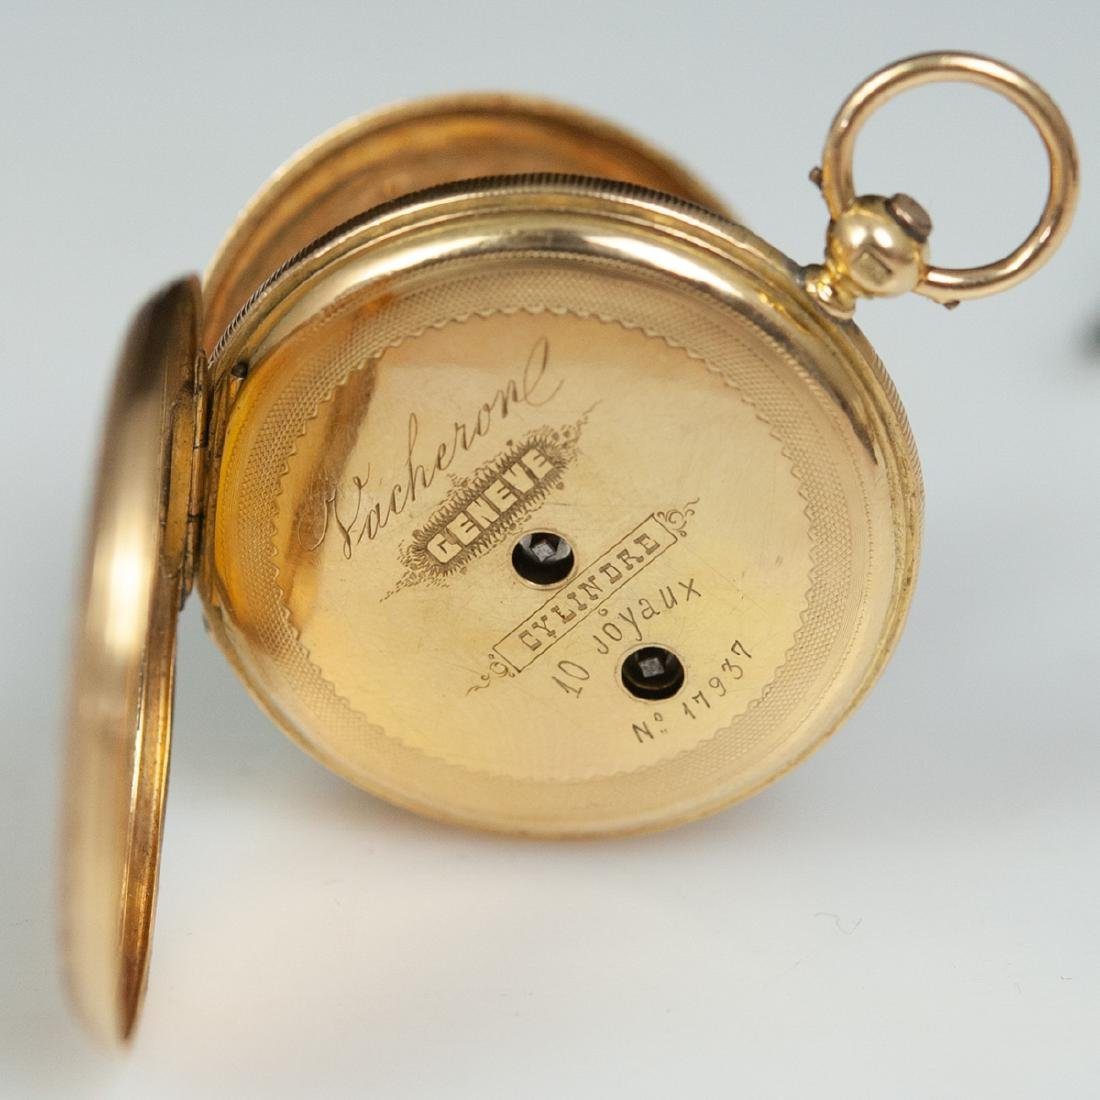 Vacheron 18kt Gold Enameled Pocket Watch - 7